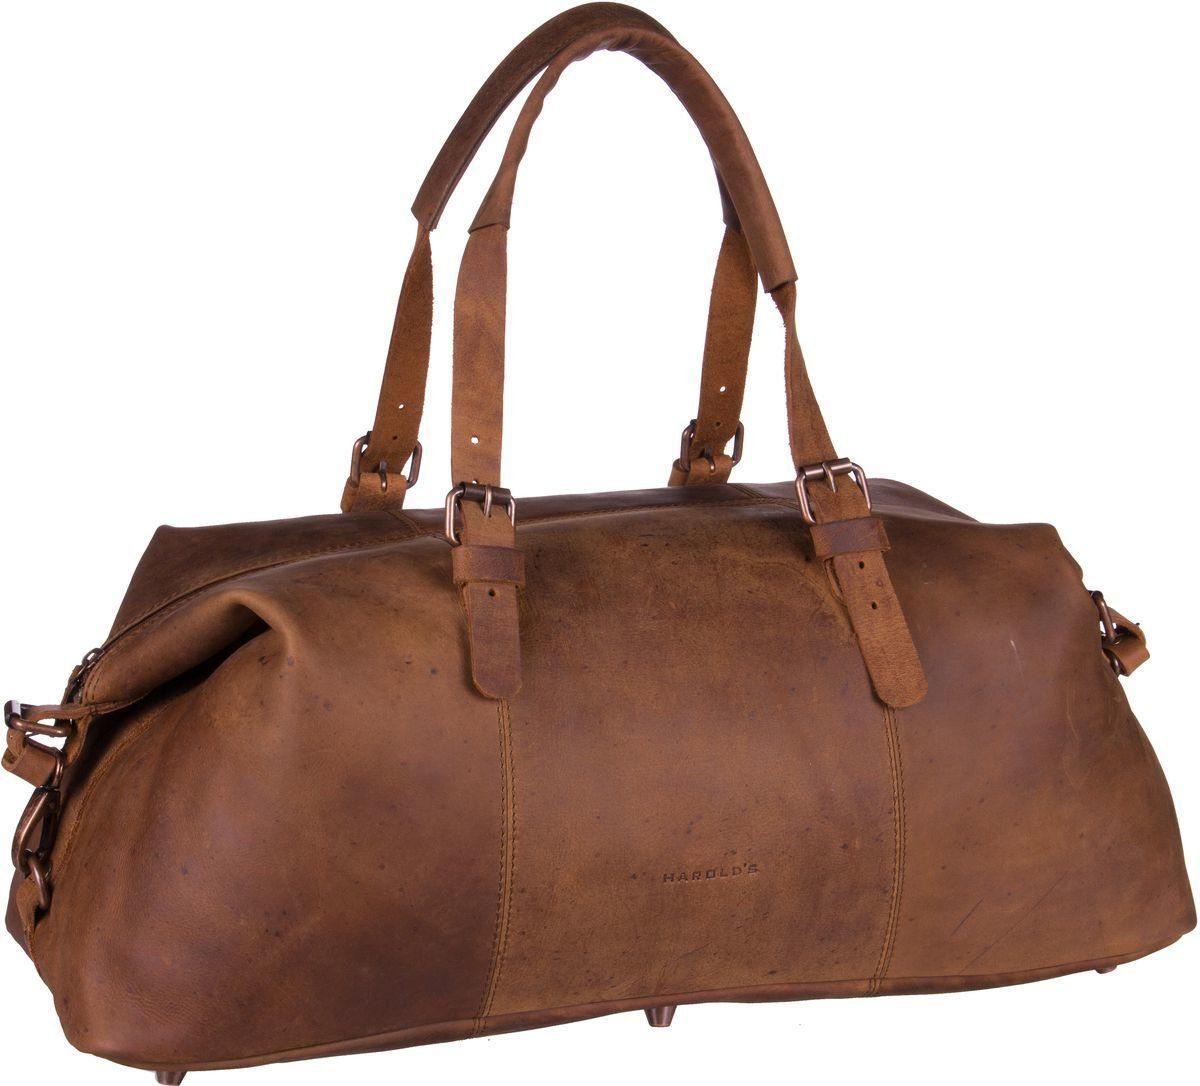 Harold's Reisetasche »Antic 2714 Reisetasche«